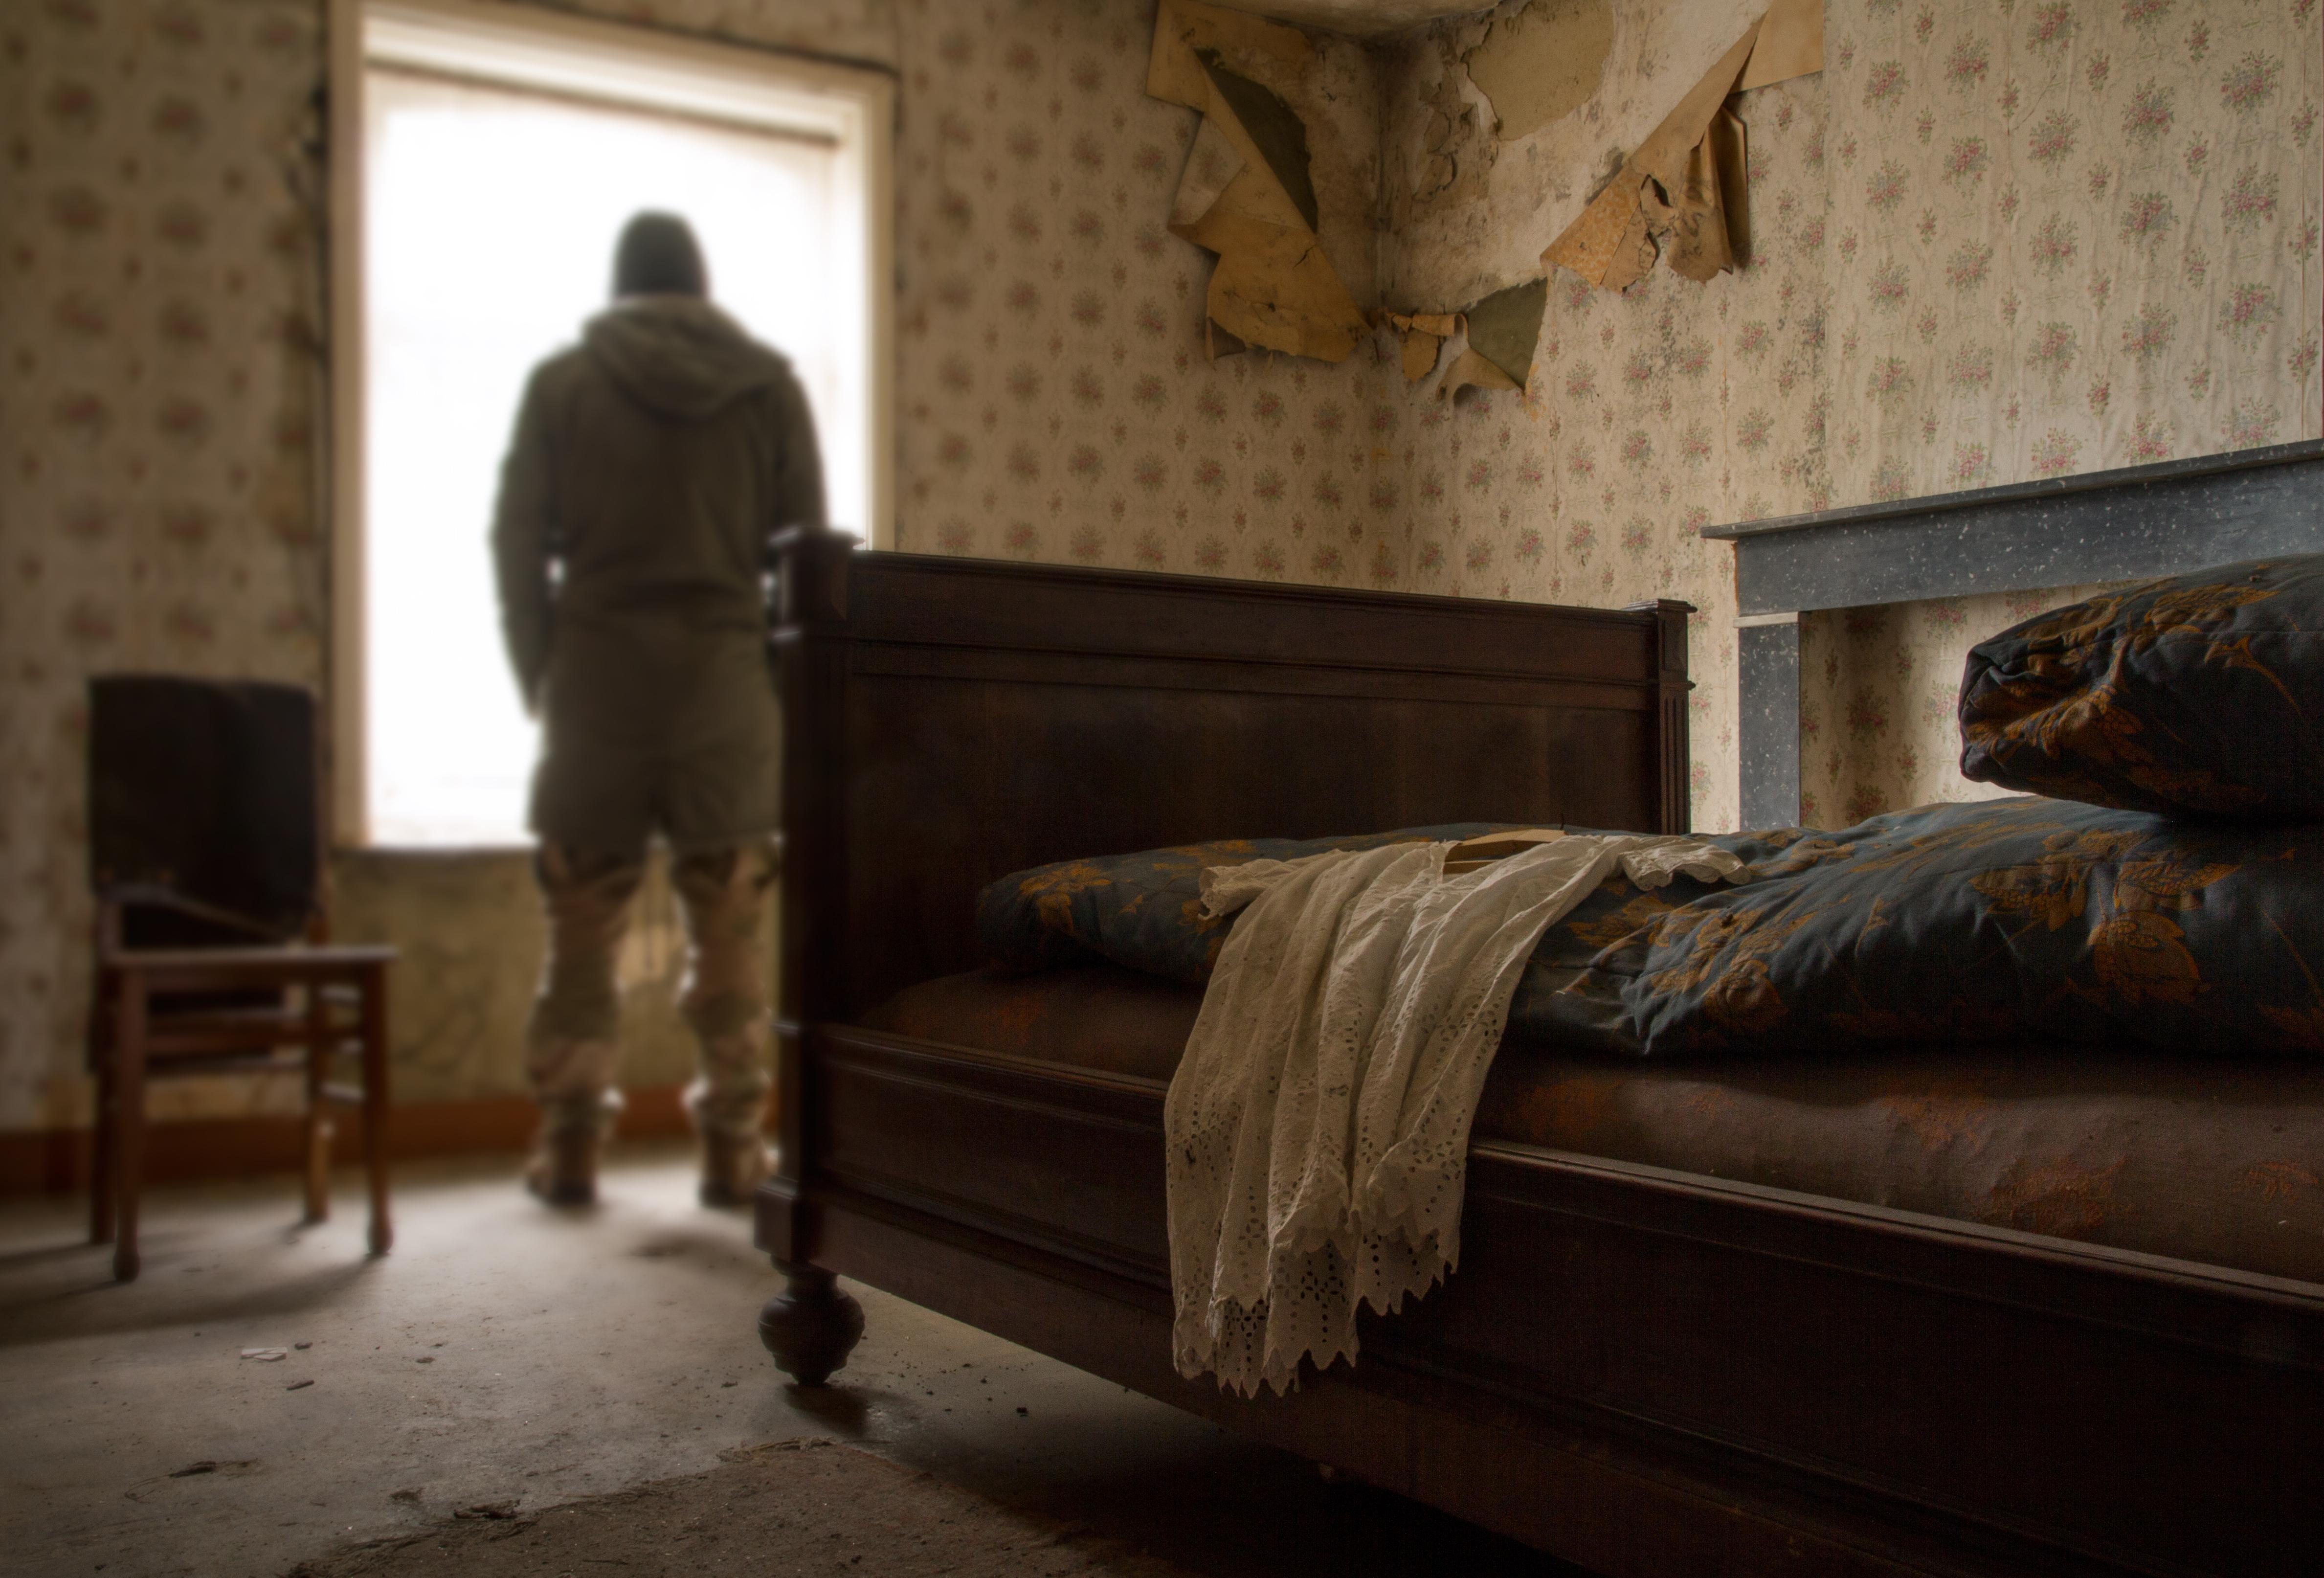 Hintergrundbilder : Fenster, Zimmer, verlassen, Bett, Mauer, Holz ...